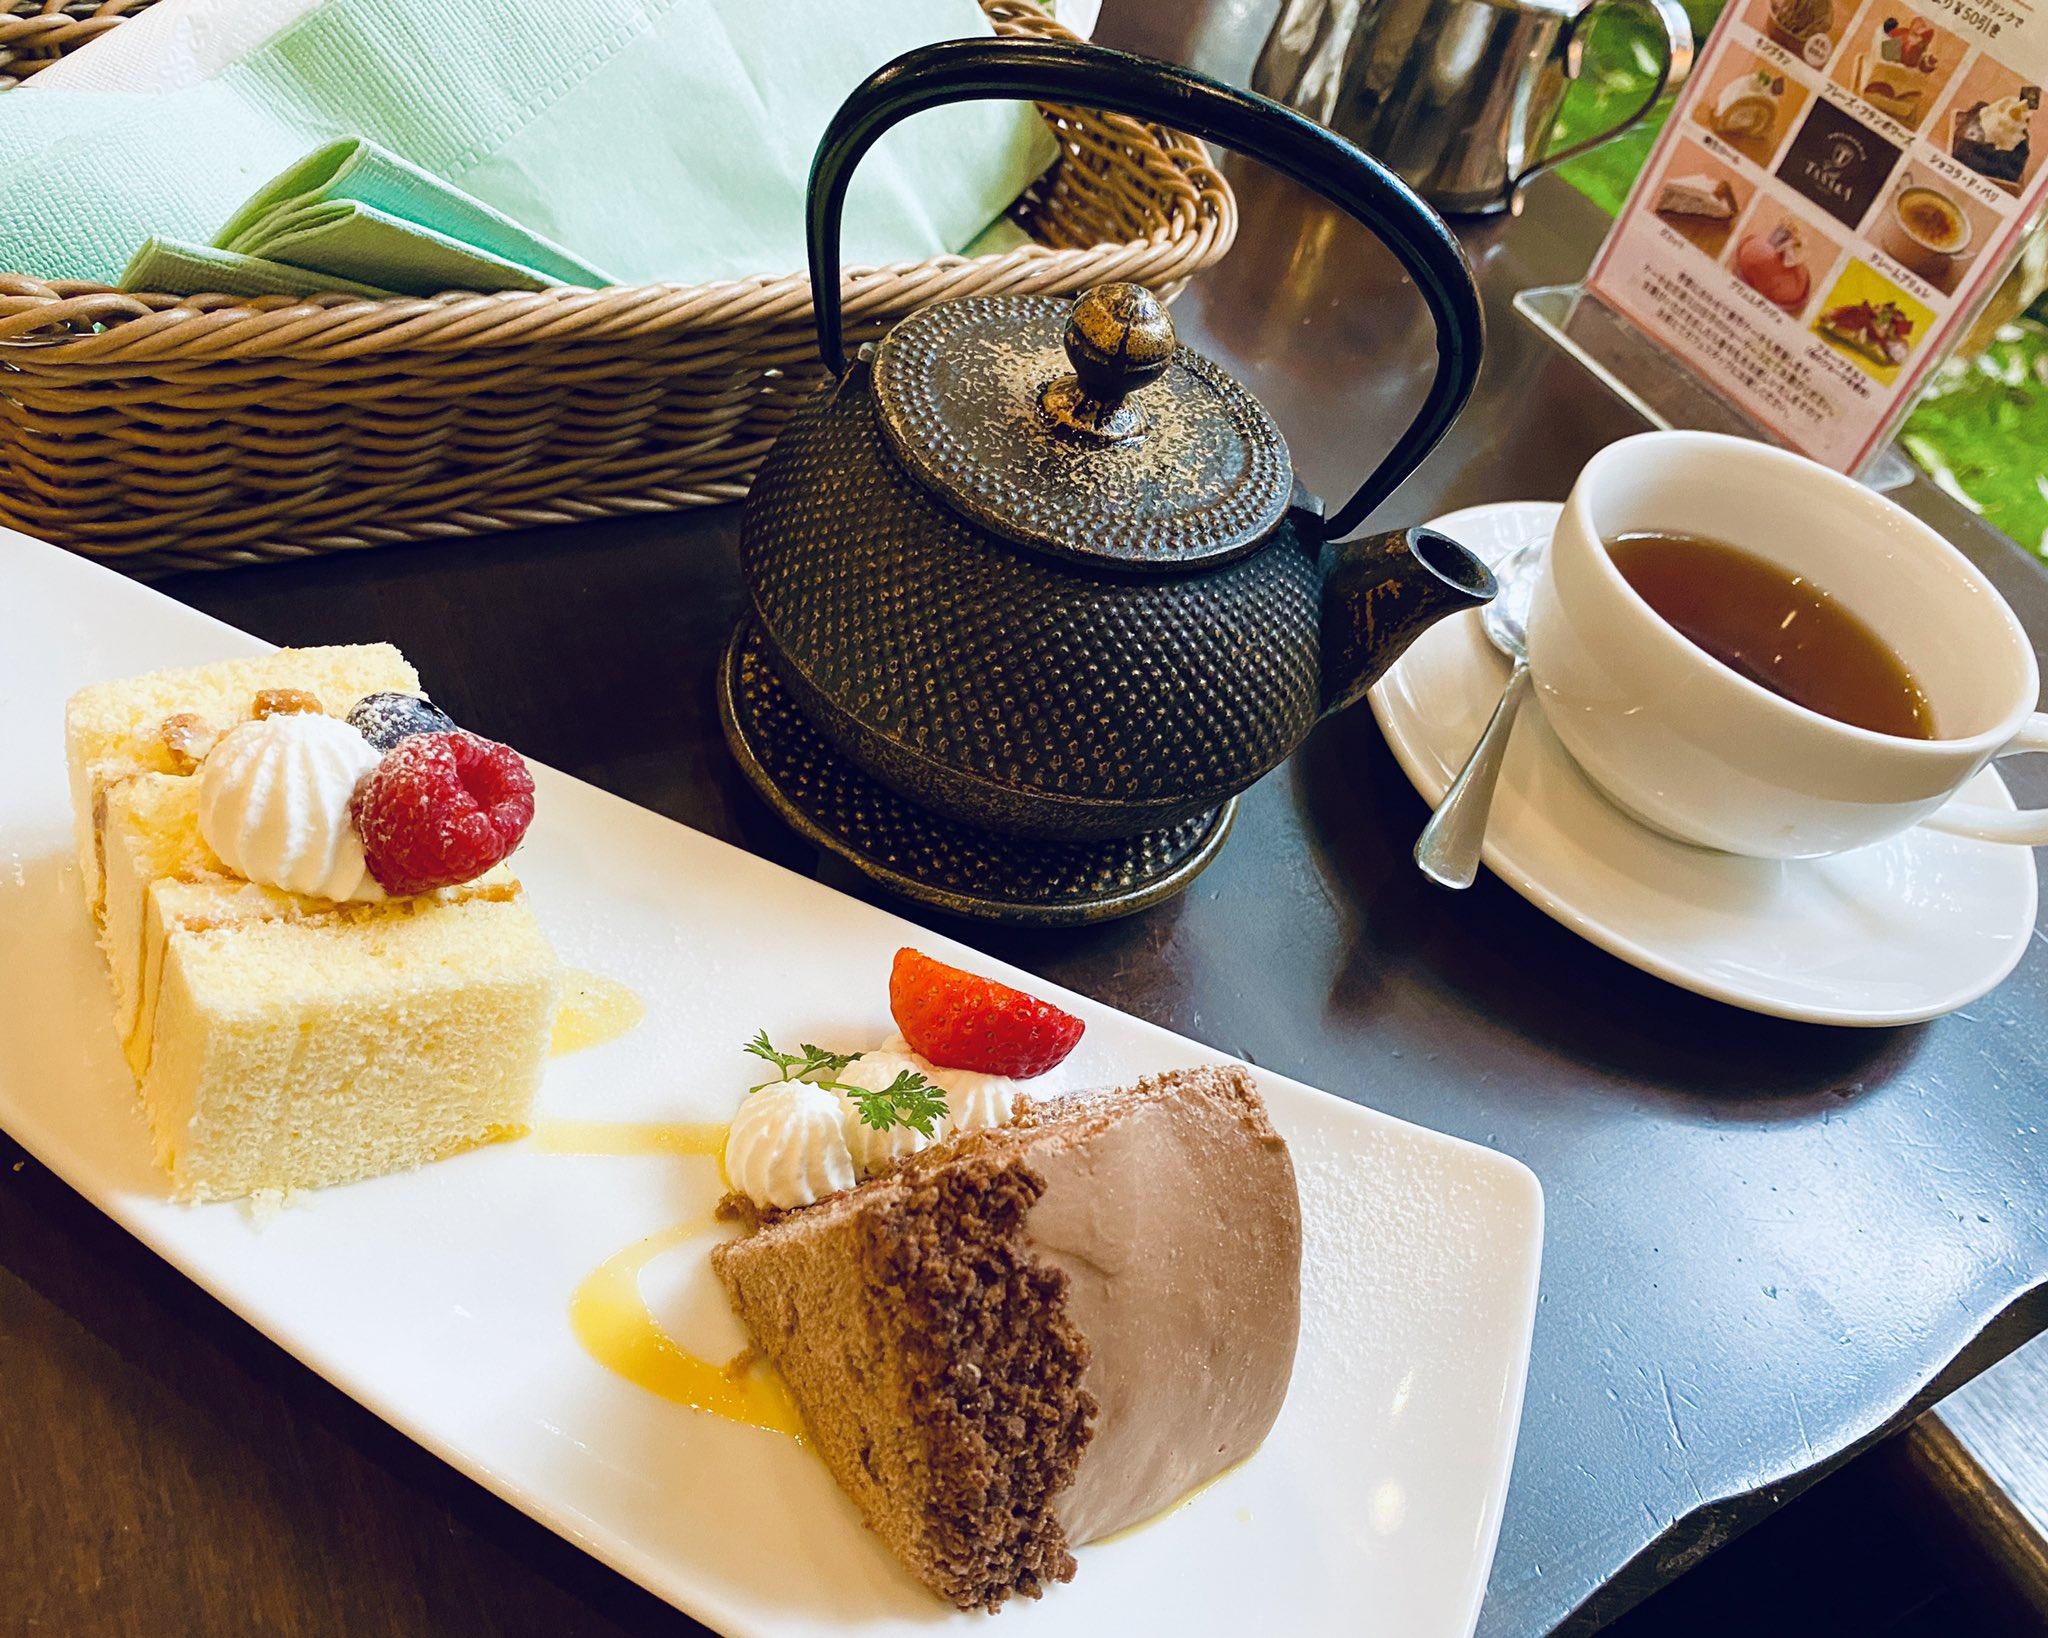 Cakes and a tea. https://t.co/K2vl4ZtpYq